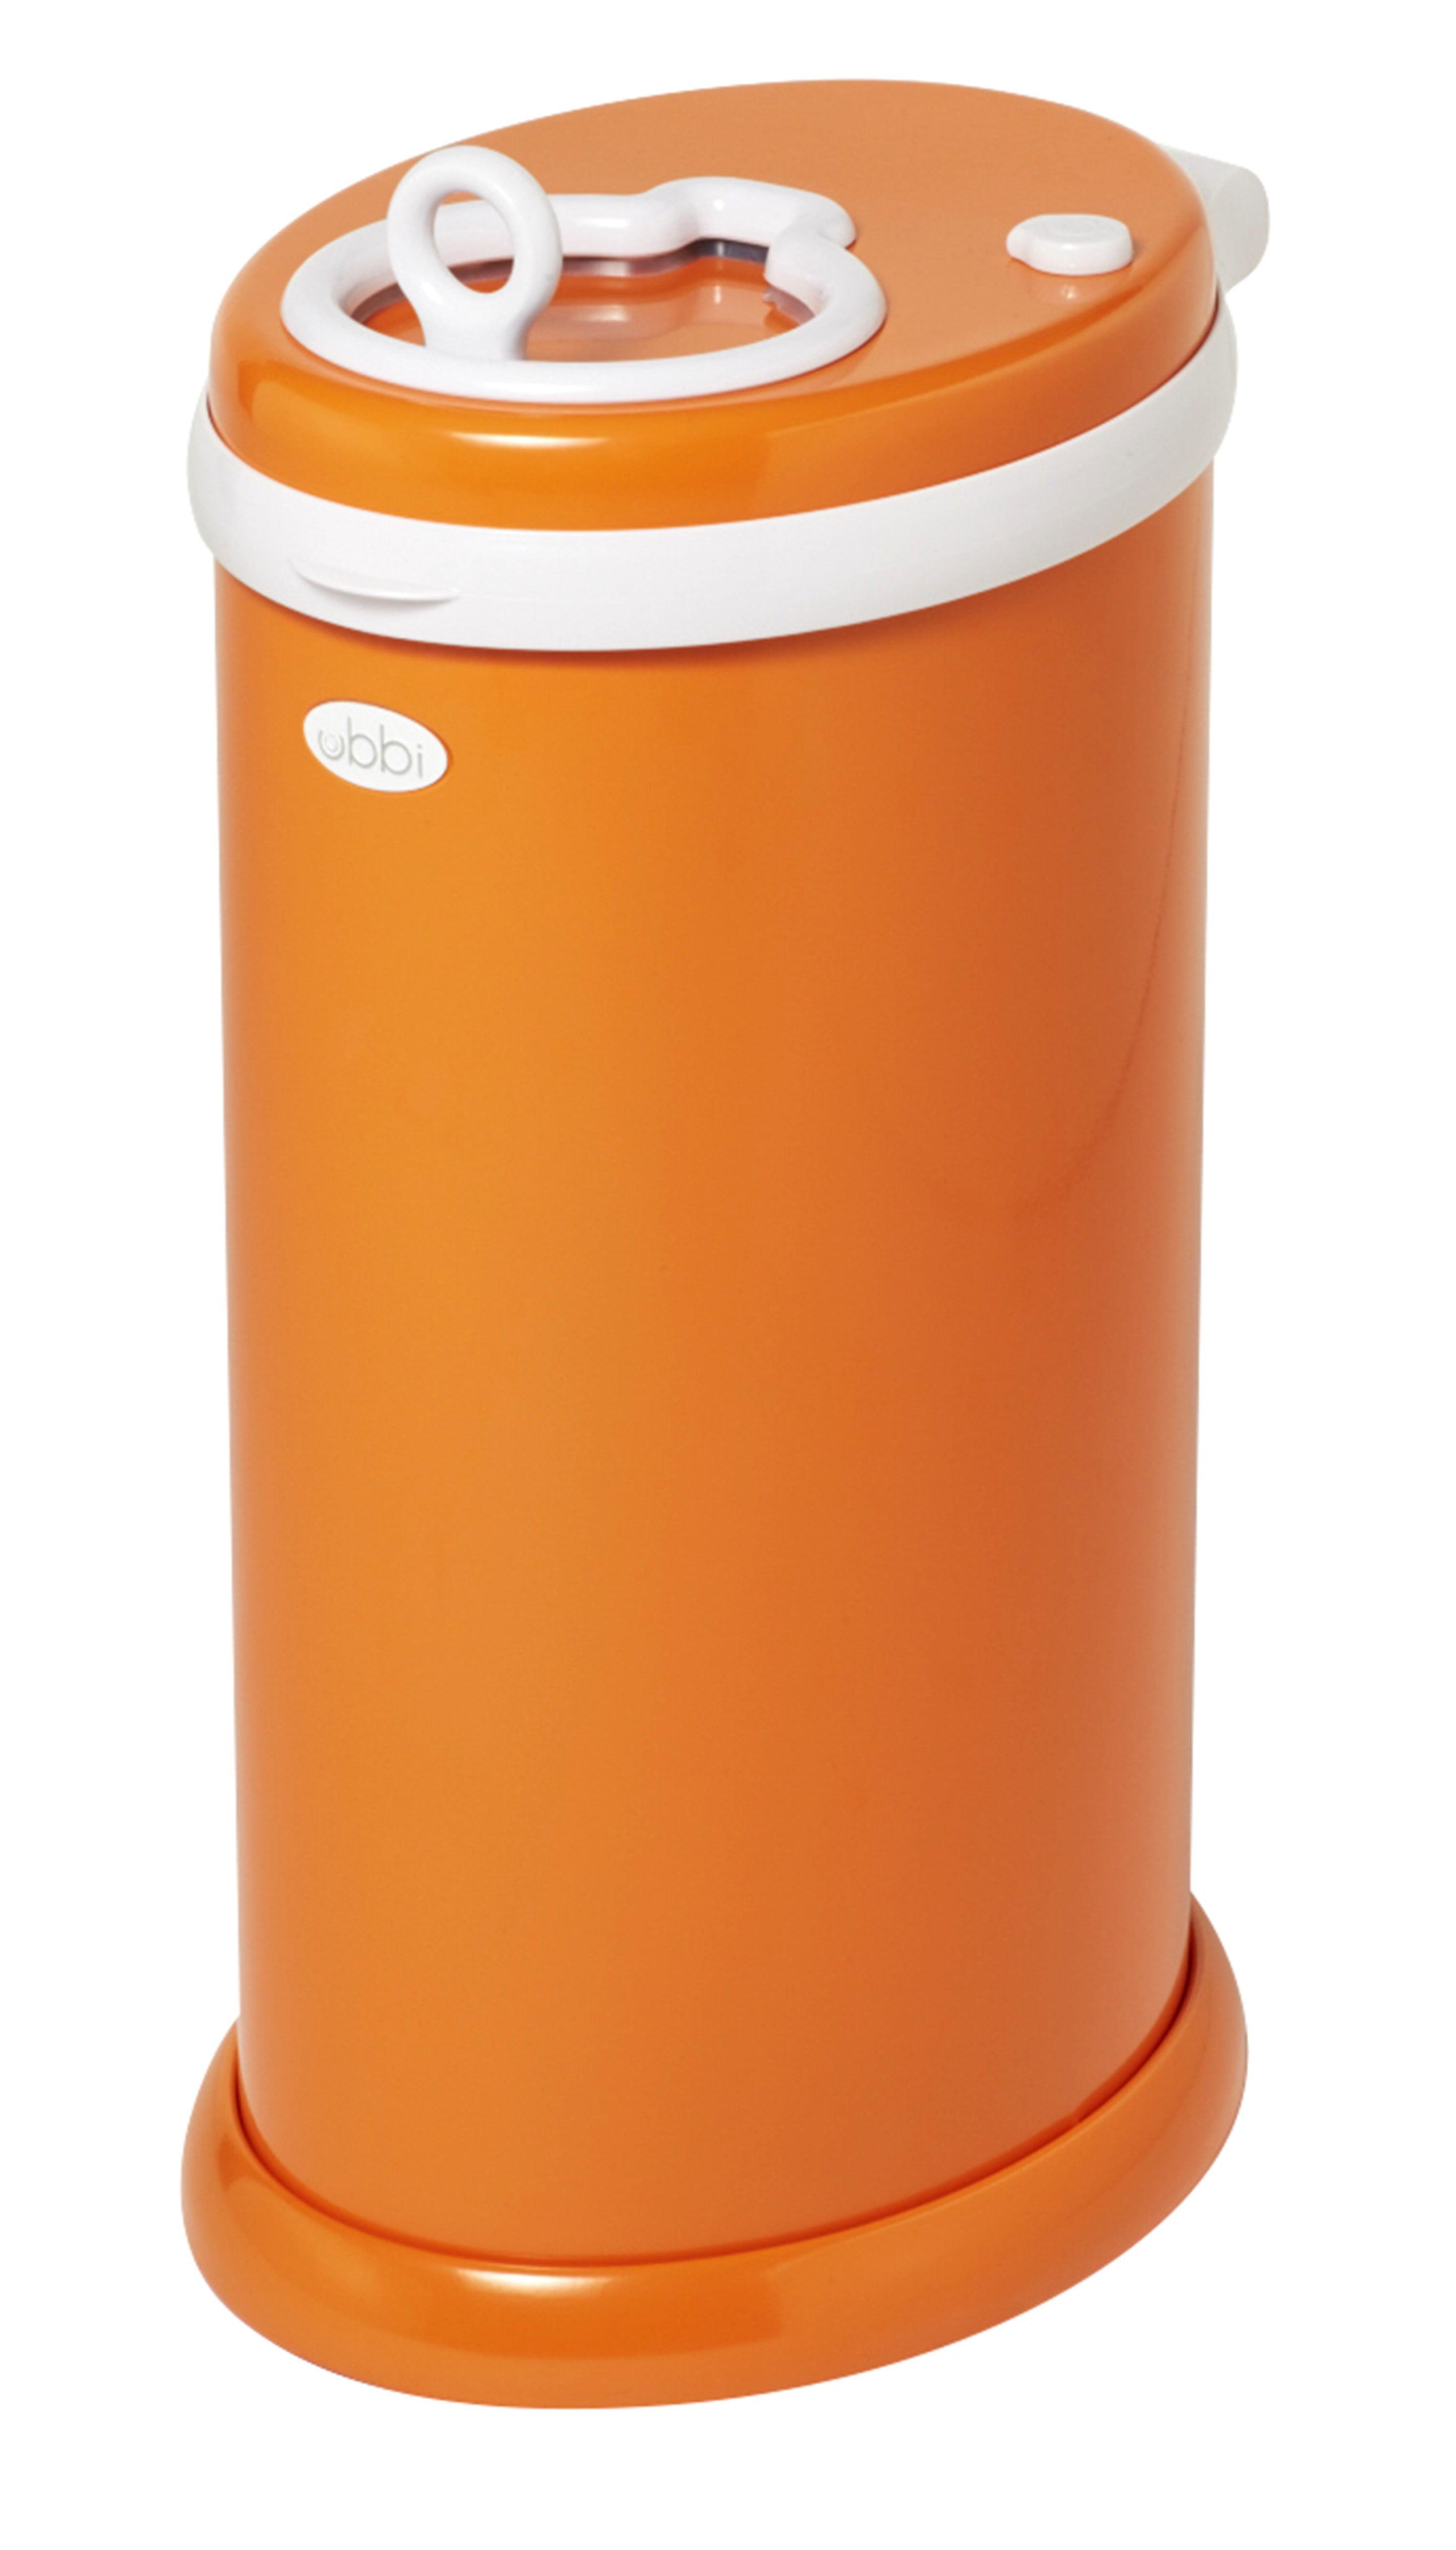 Ubbi Steel Diaper Pail, Orange by Ubbi